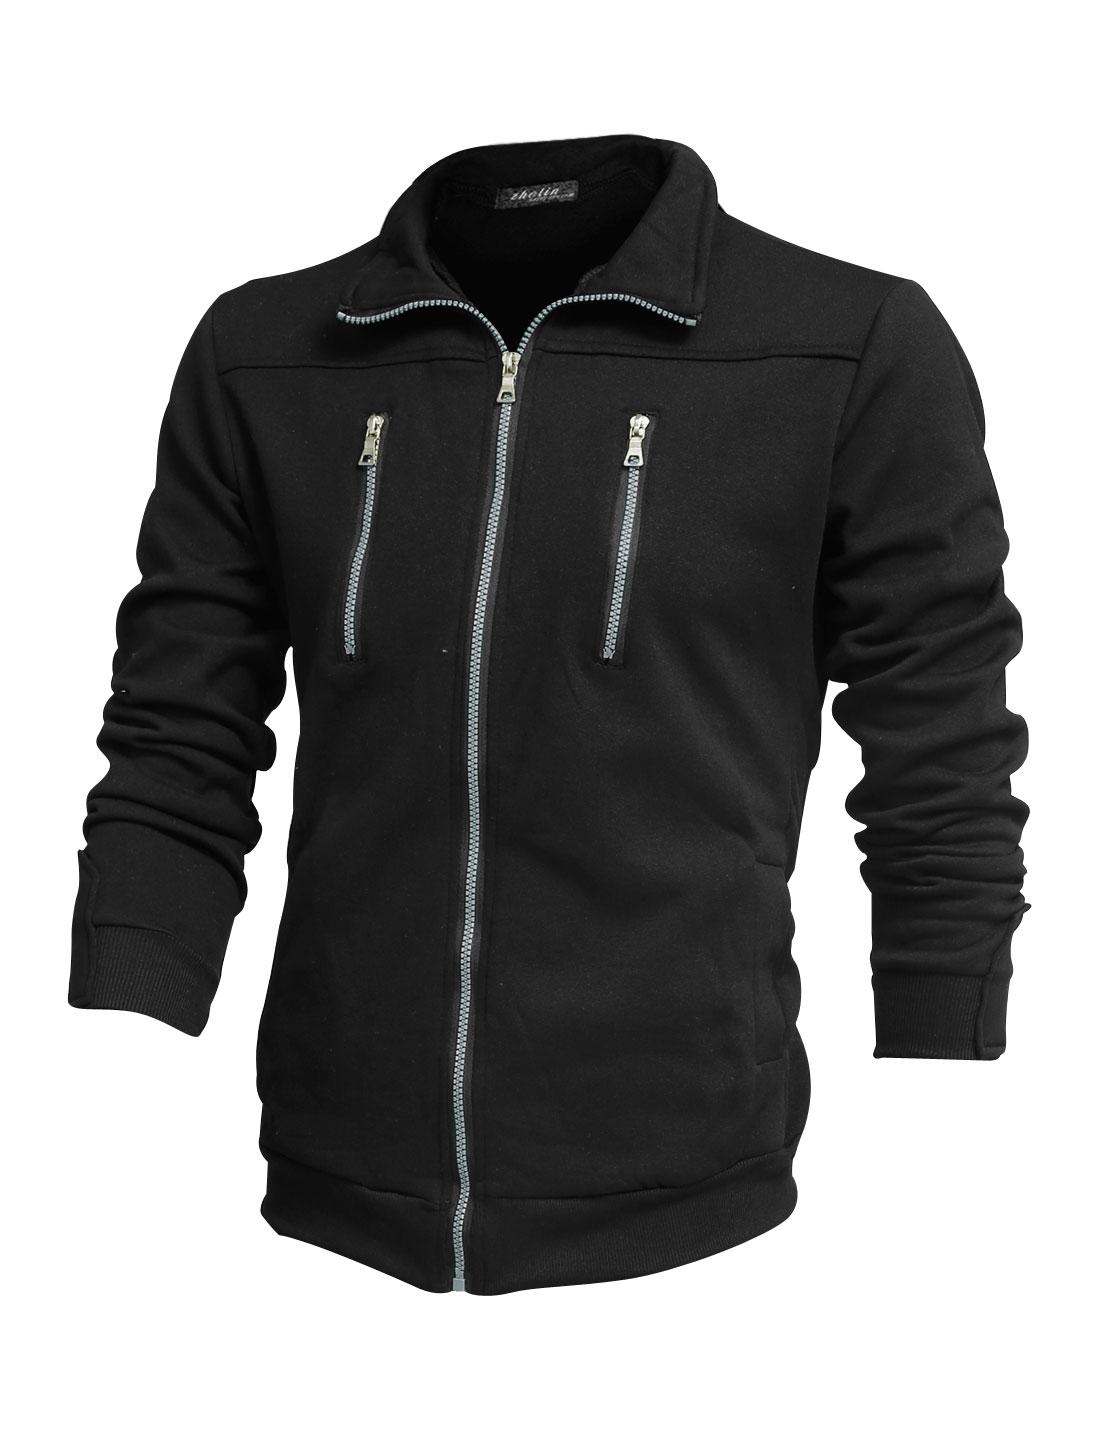 Men Turndown Collar Mock Zip-Up Pockets Ribbed Trim Leisure Jacket Black M